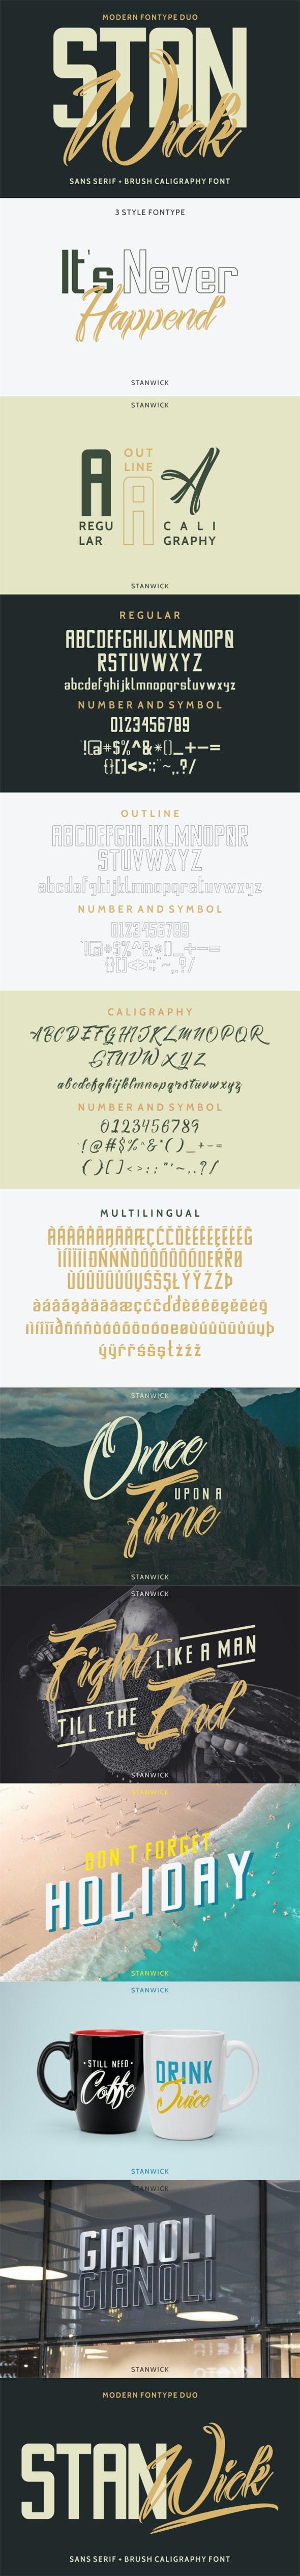 Stanwick Font Duo - Calligraphy Script